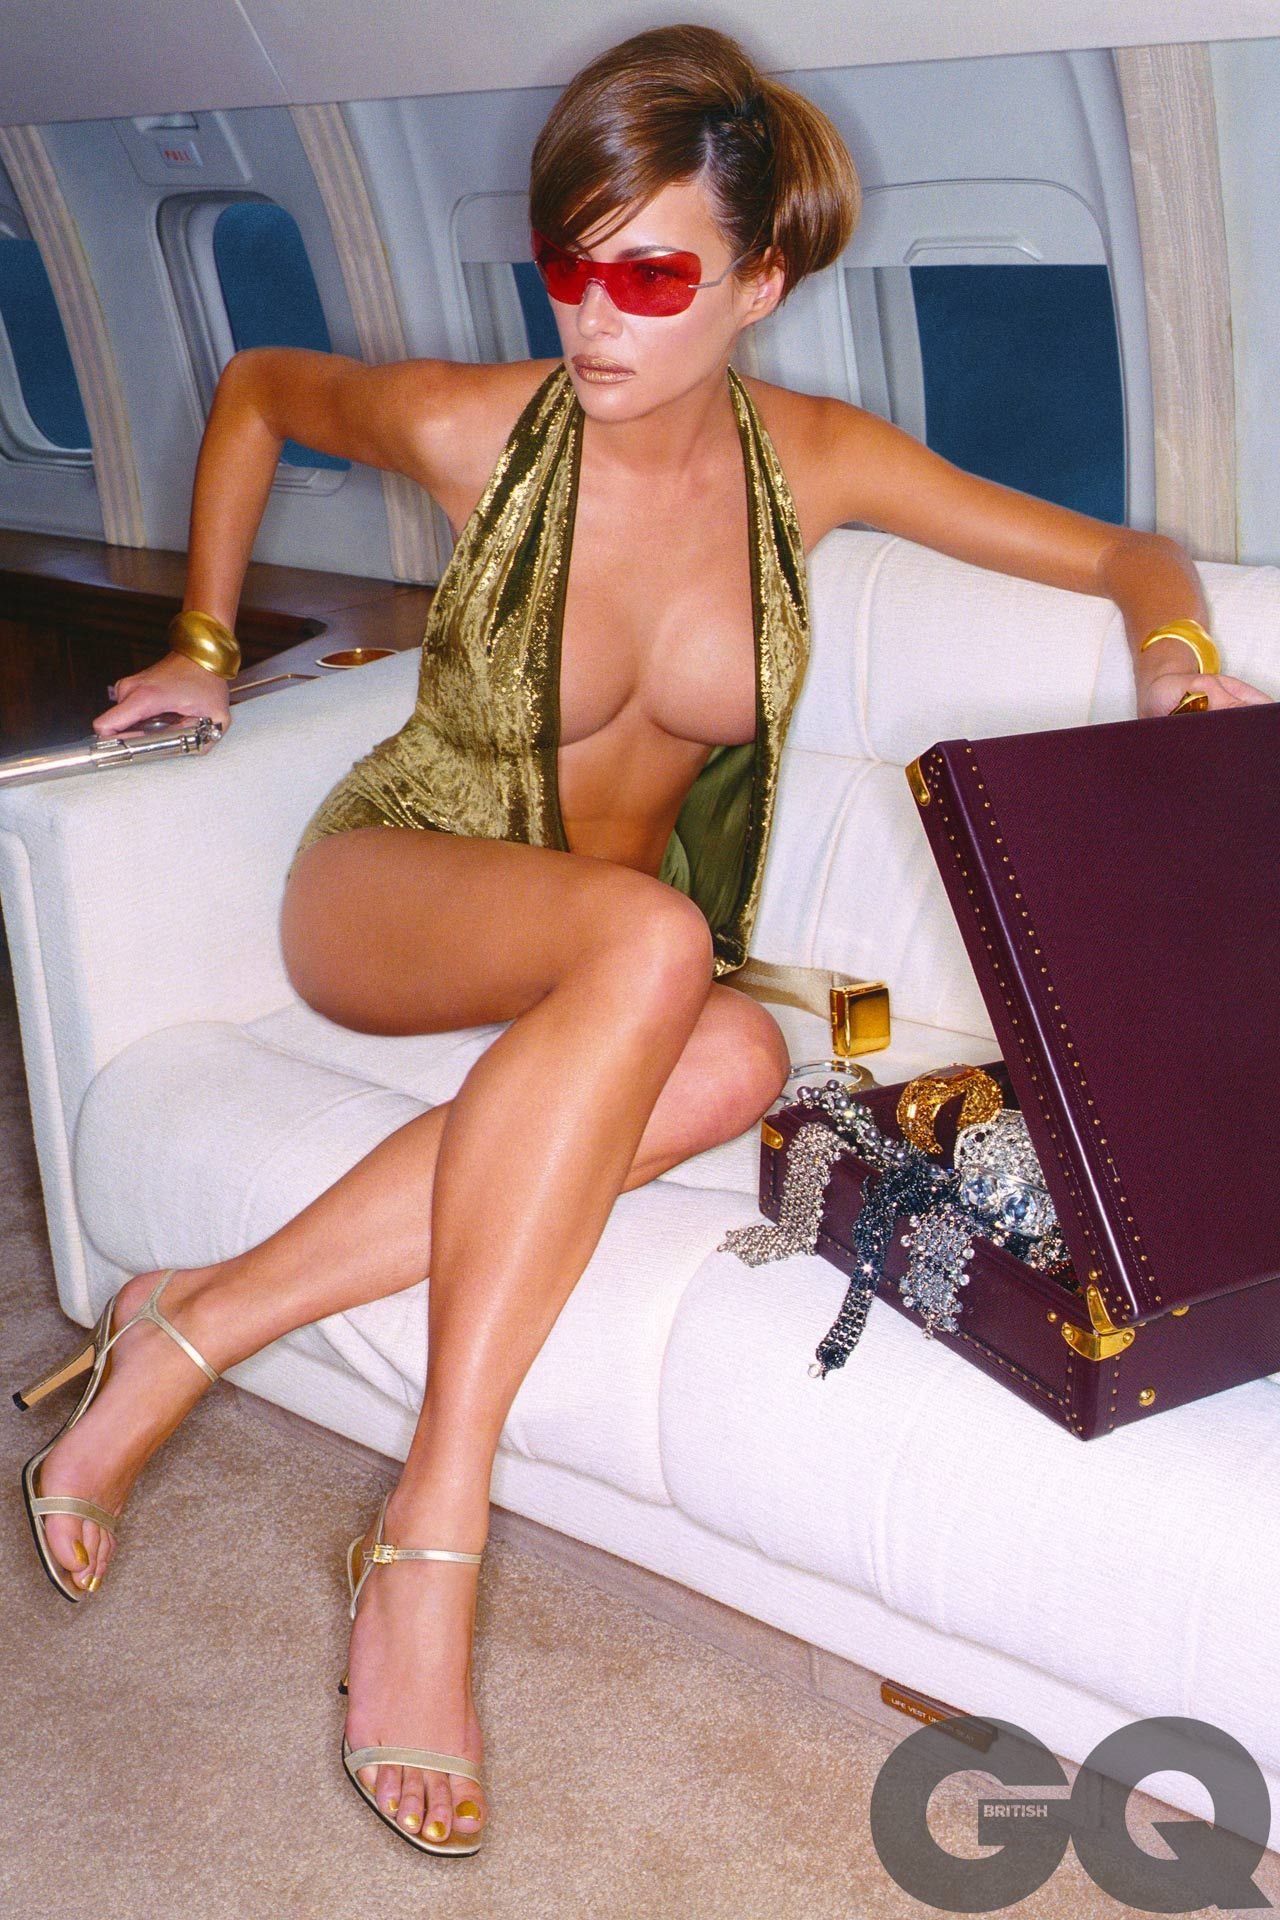 Dirty Scandalous Photos Of Melania Trump photo 13